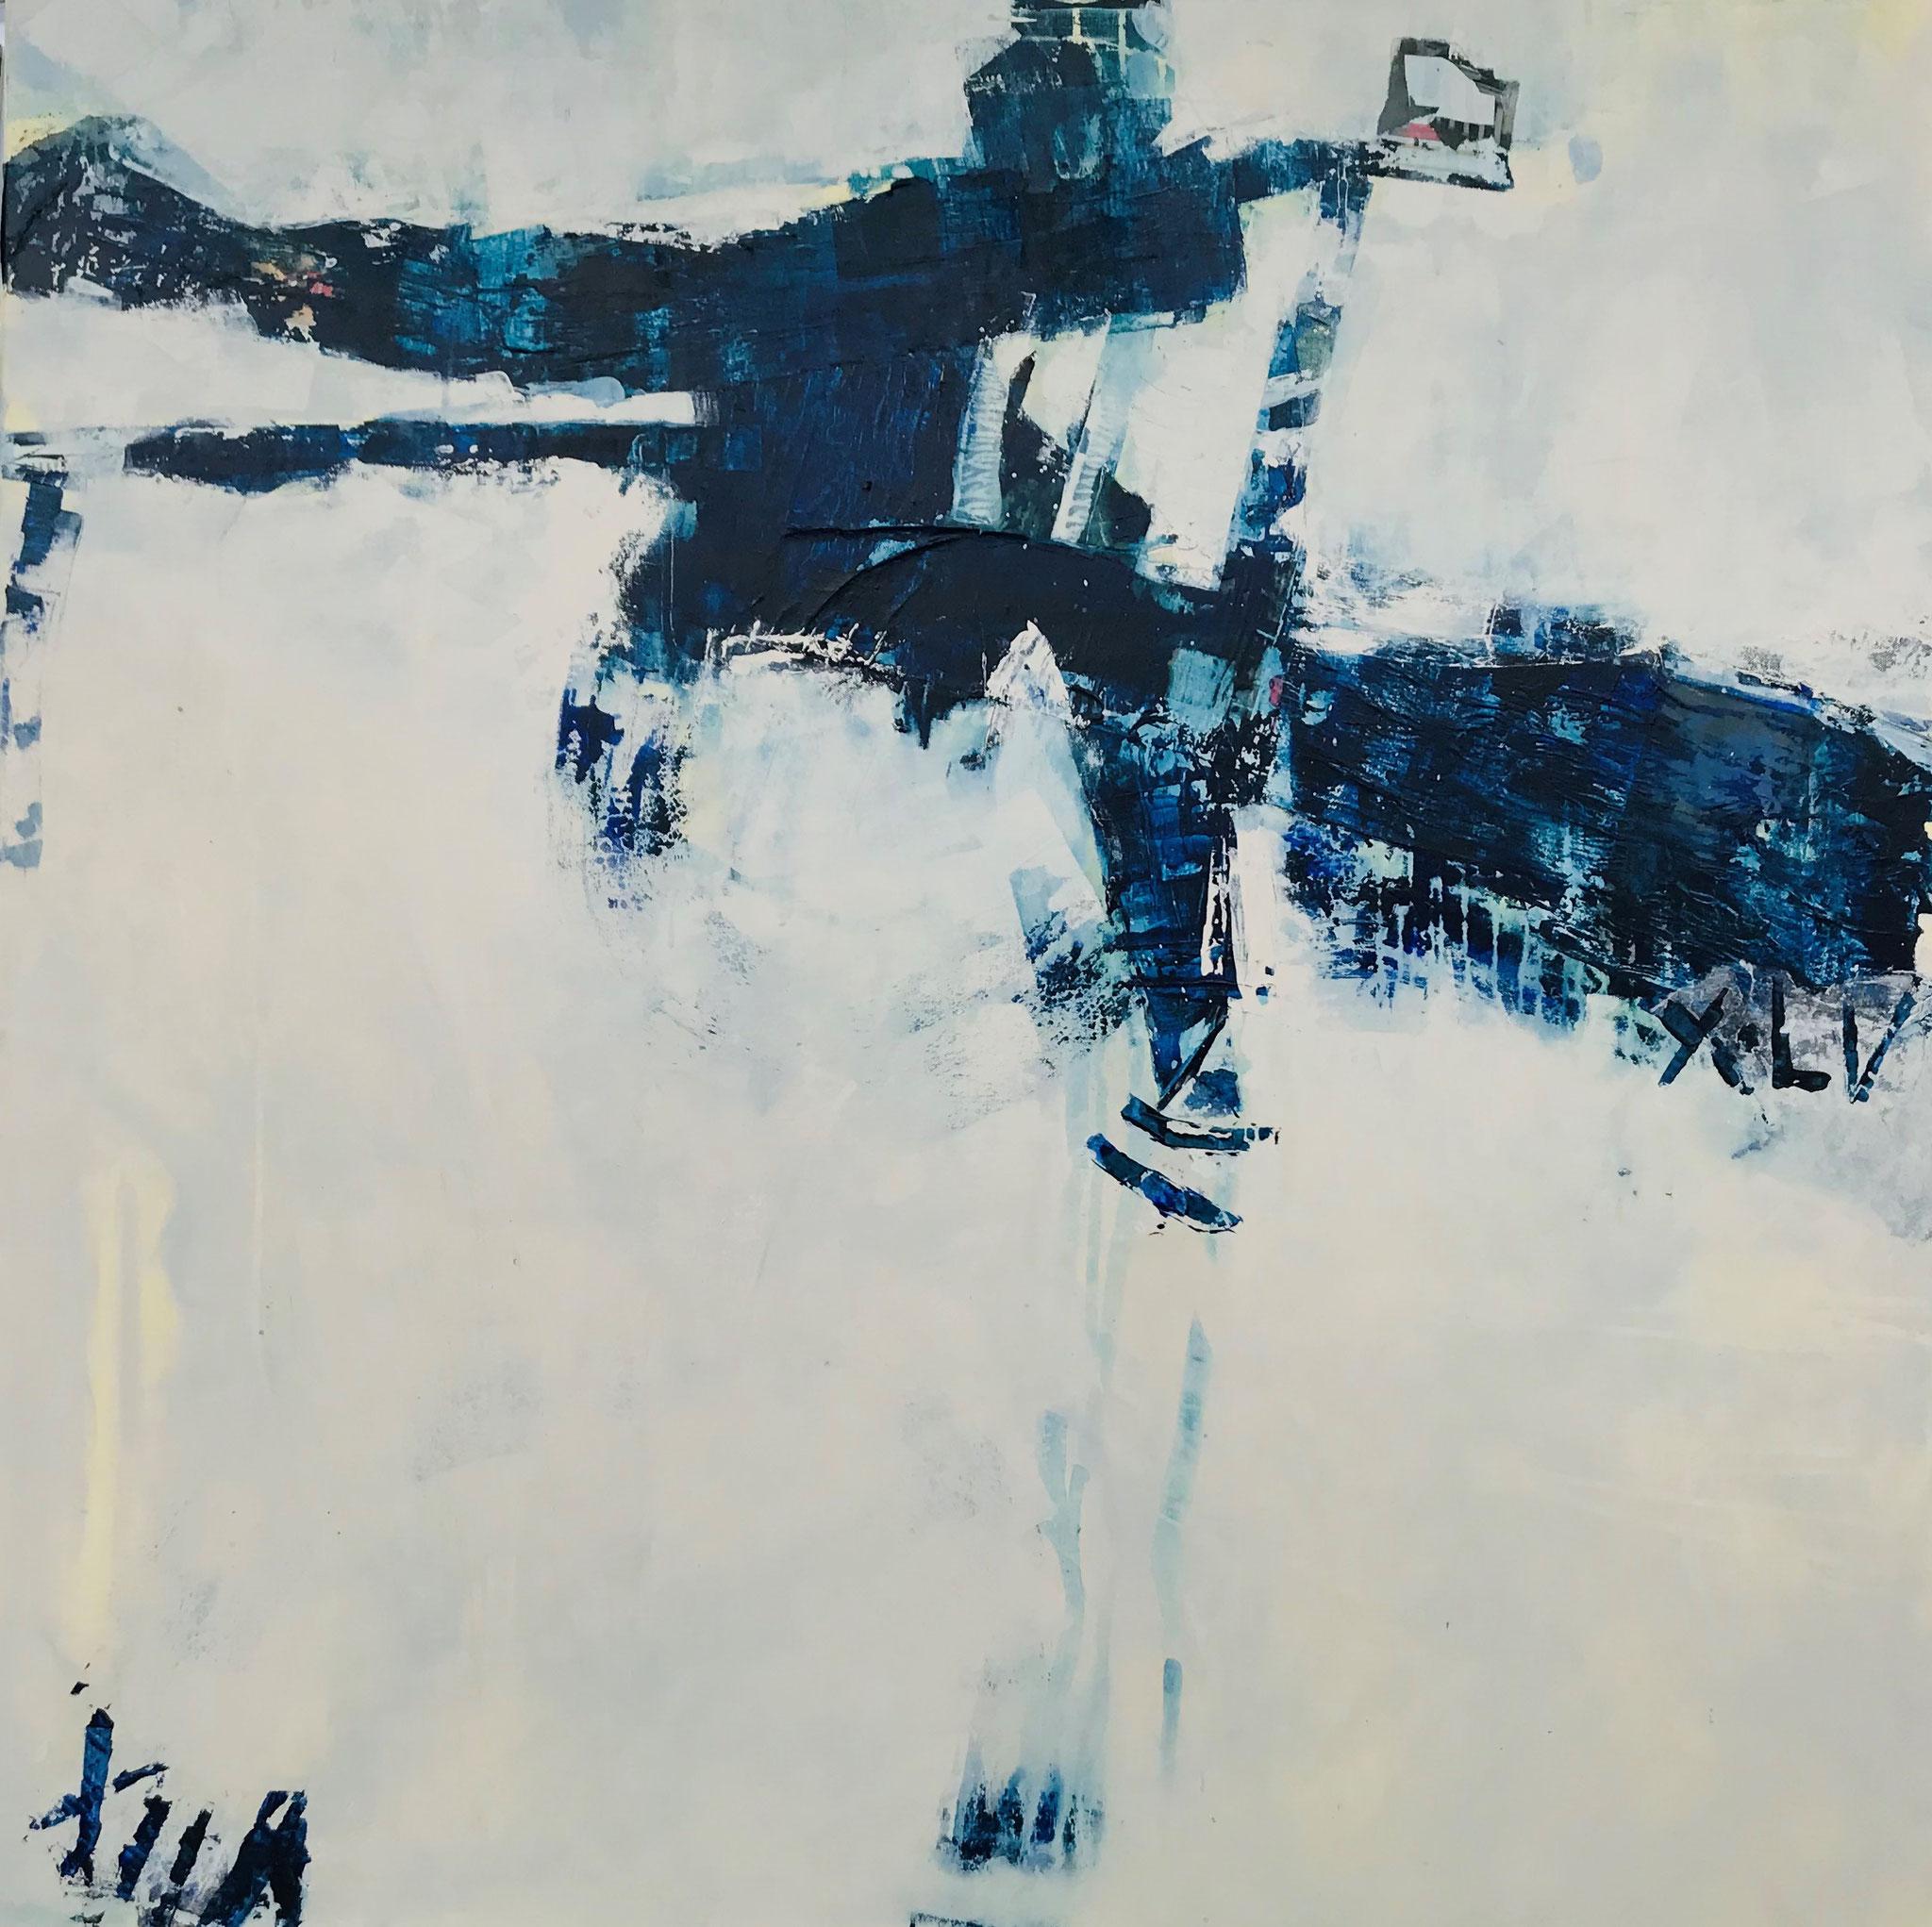 """Romeo e Julietta"", MT auf Leinwand 120x120 cm, 2019"